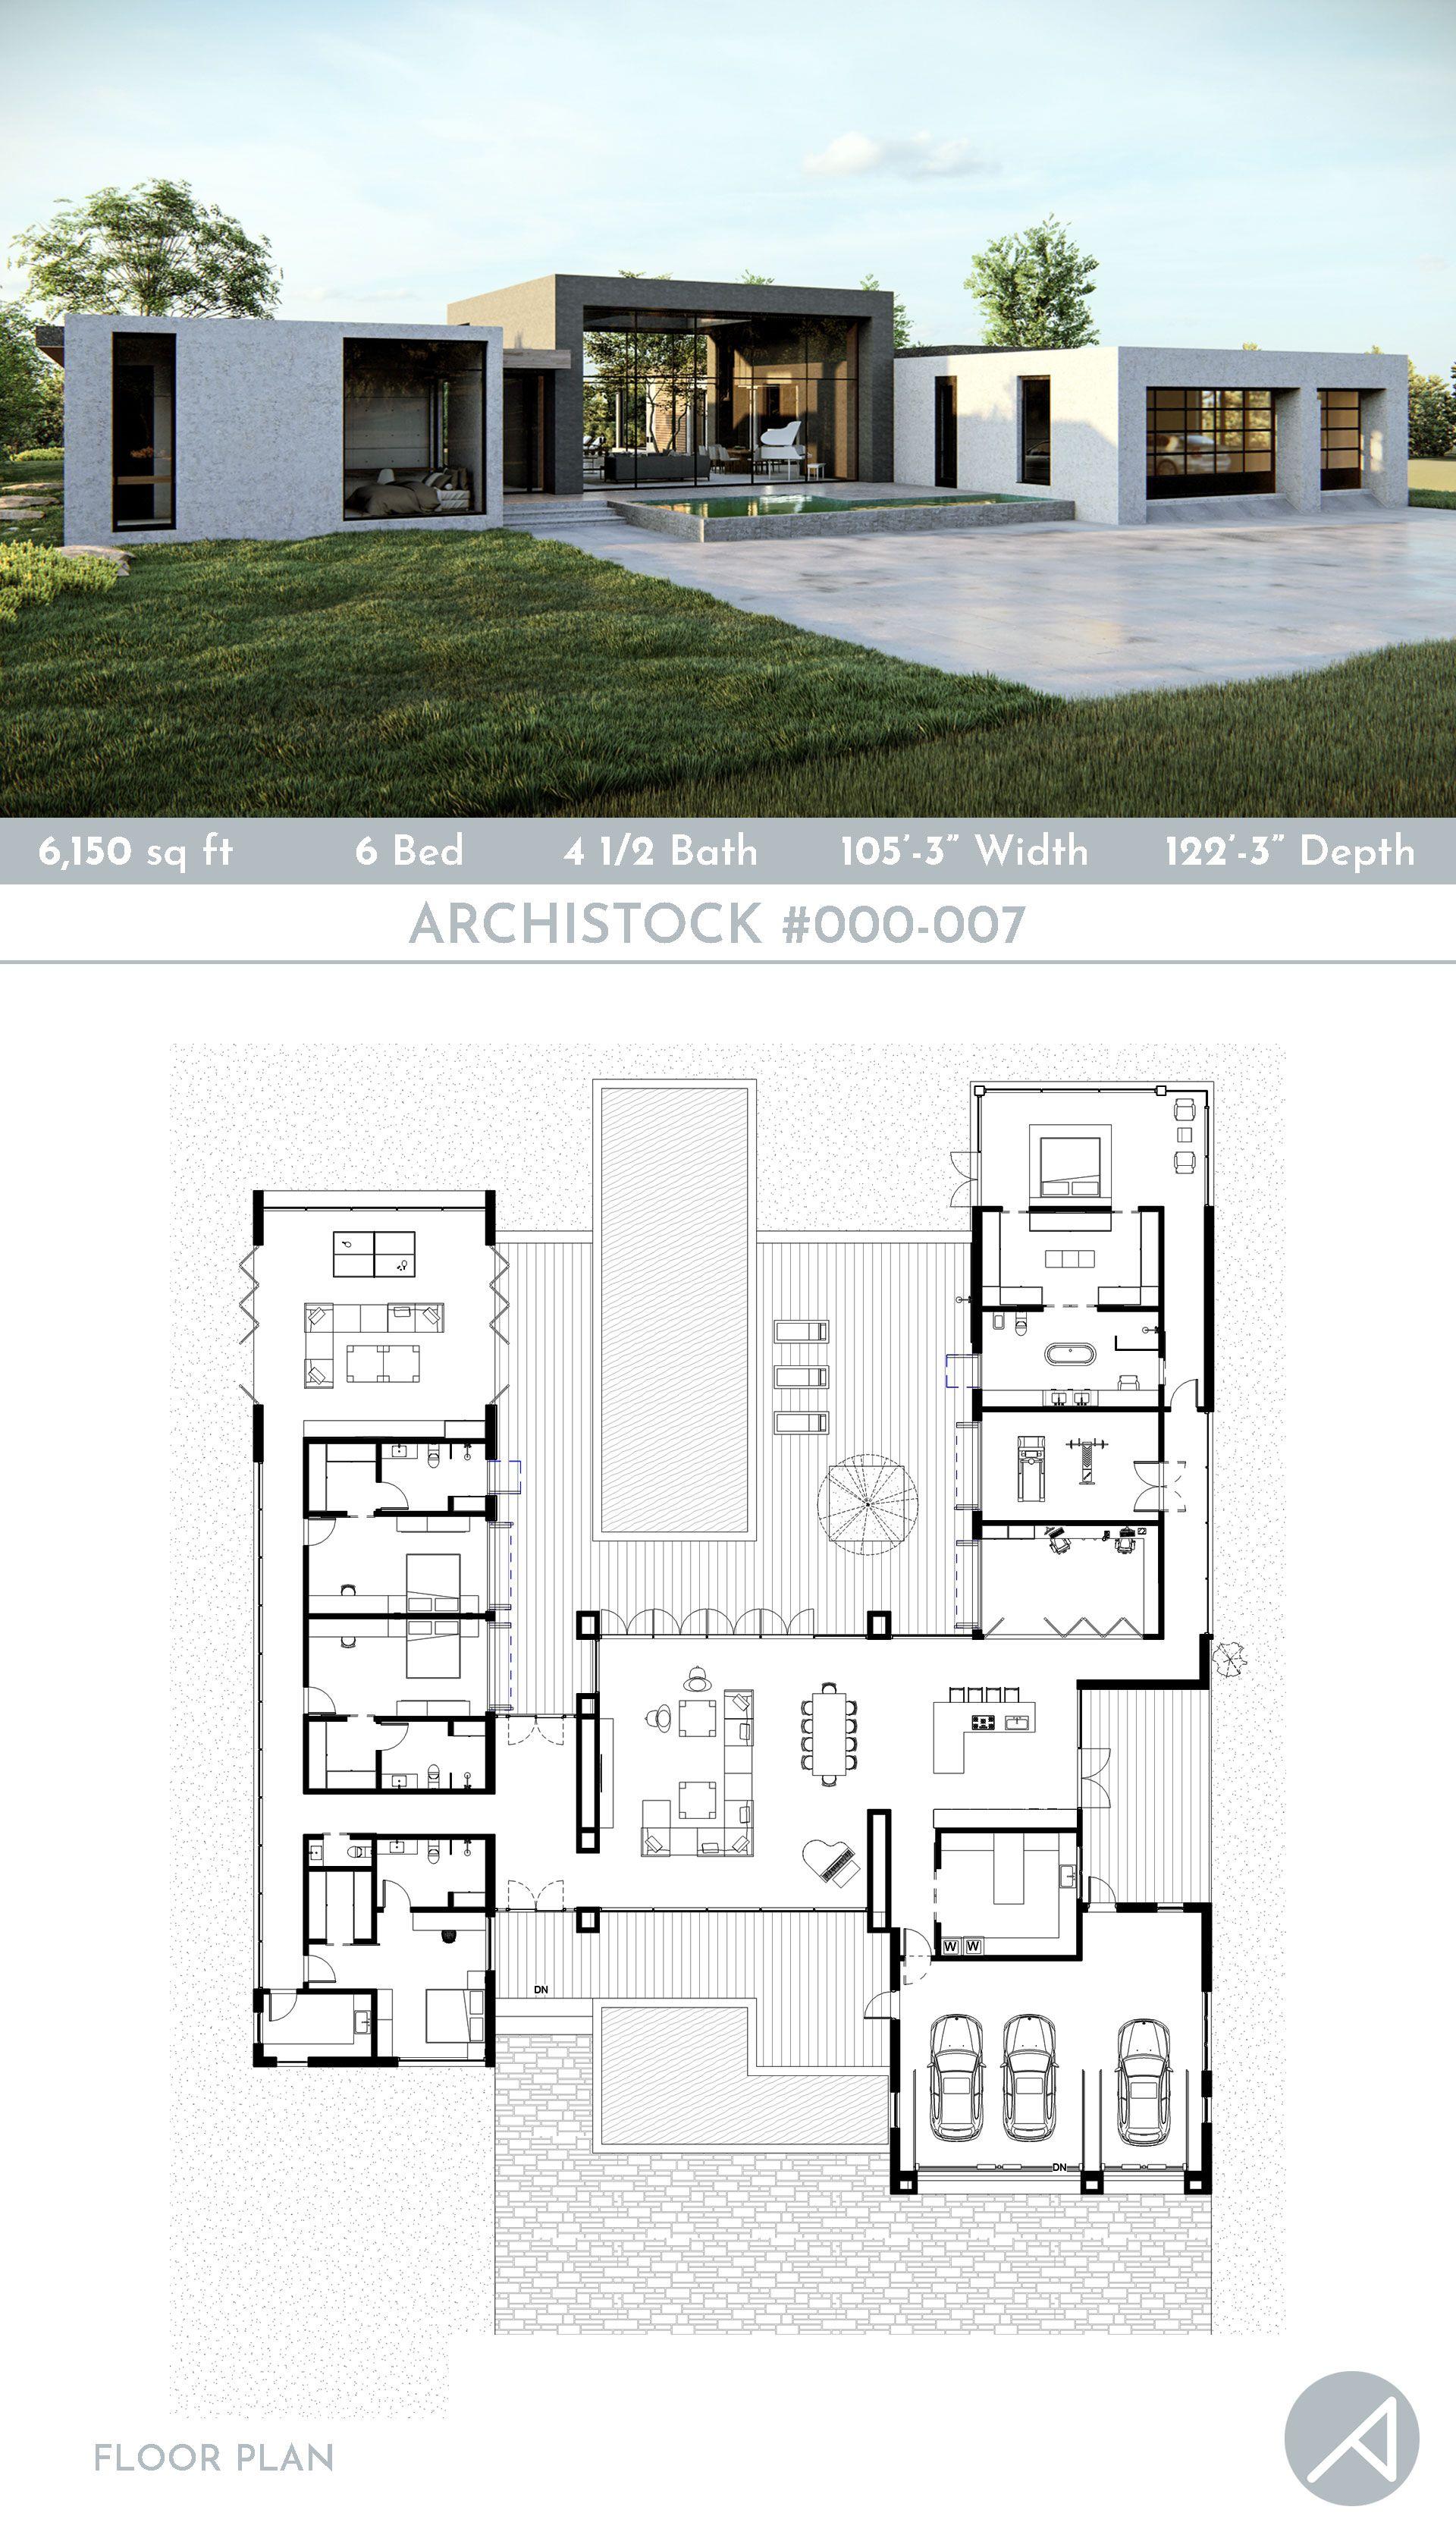 6 Bedroom Modern Minimalist Home Plan Modern Minimalist House Courtyard House Plans House Plan Gallery